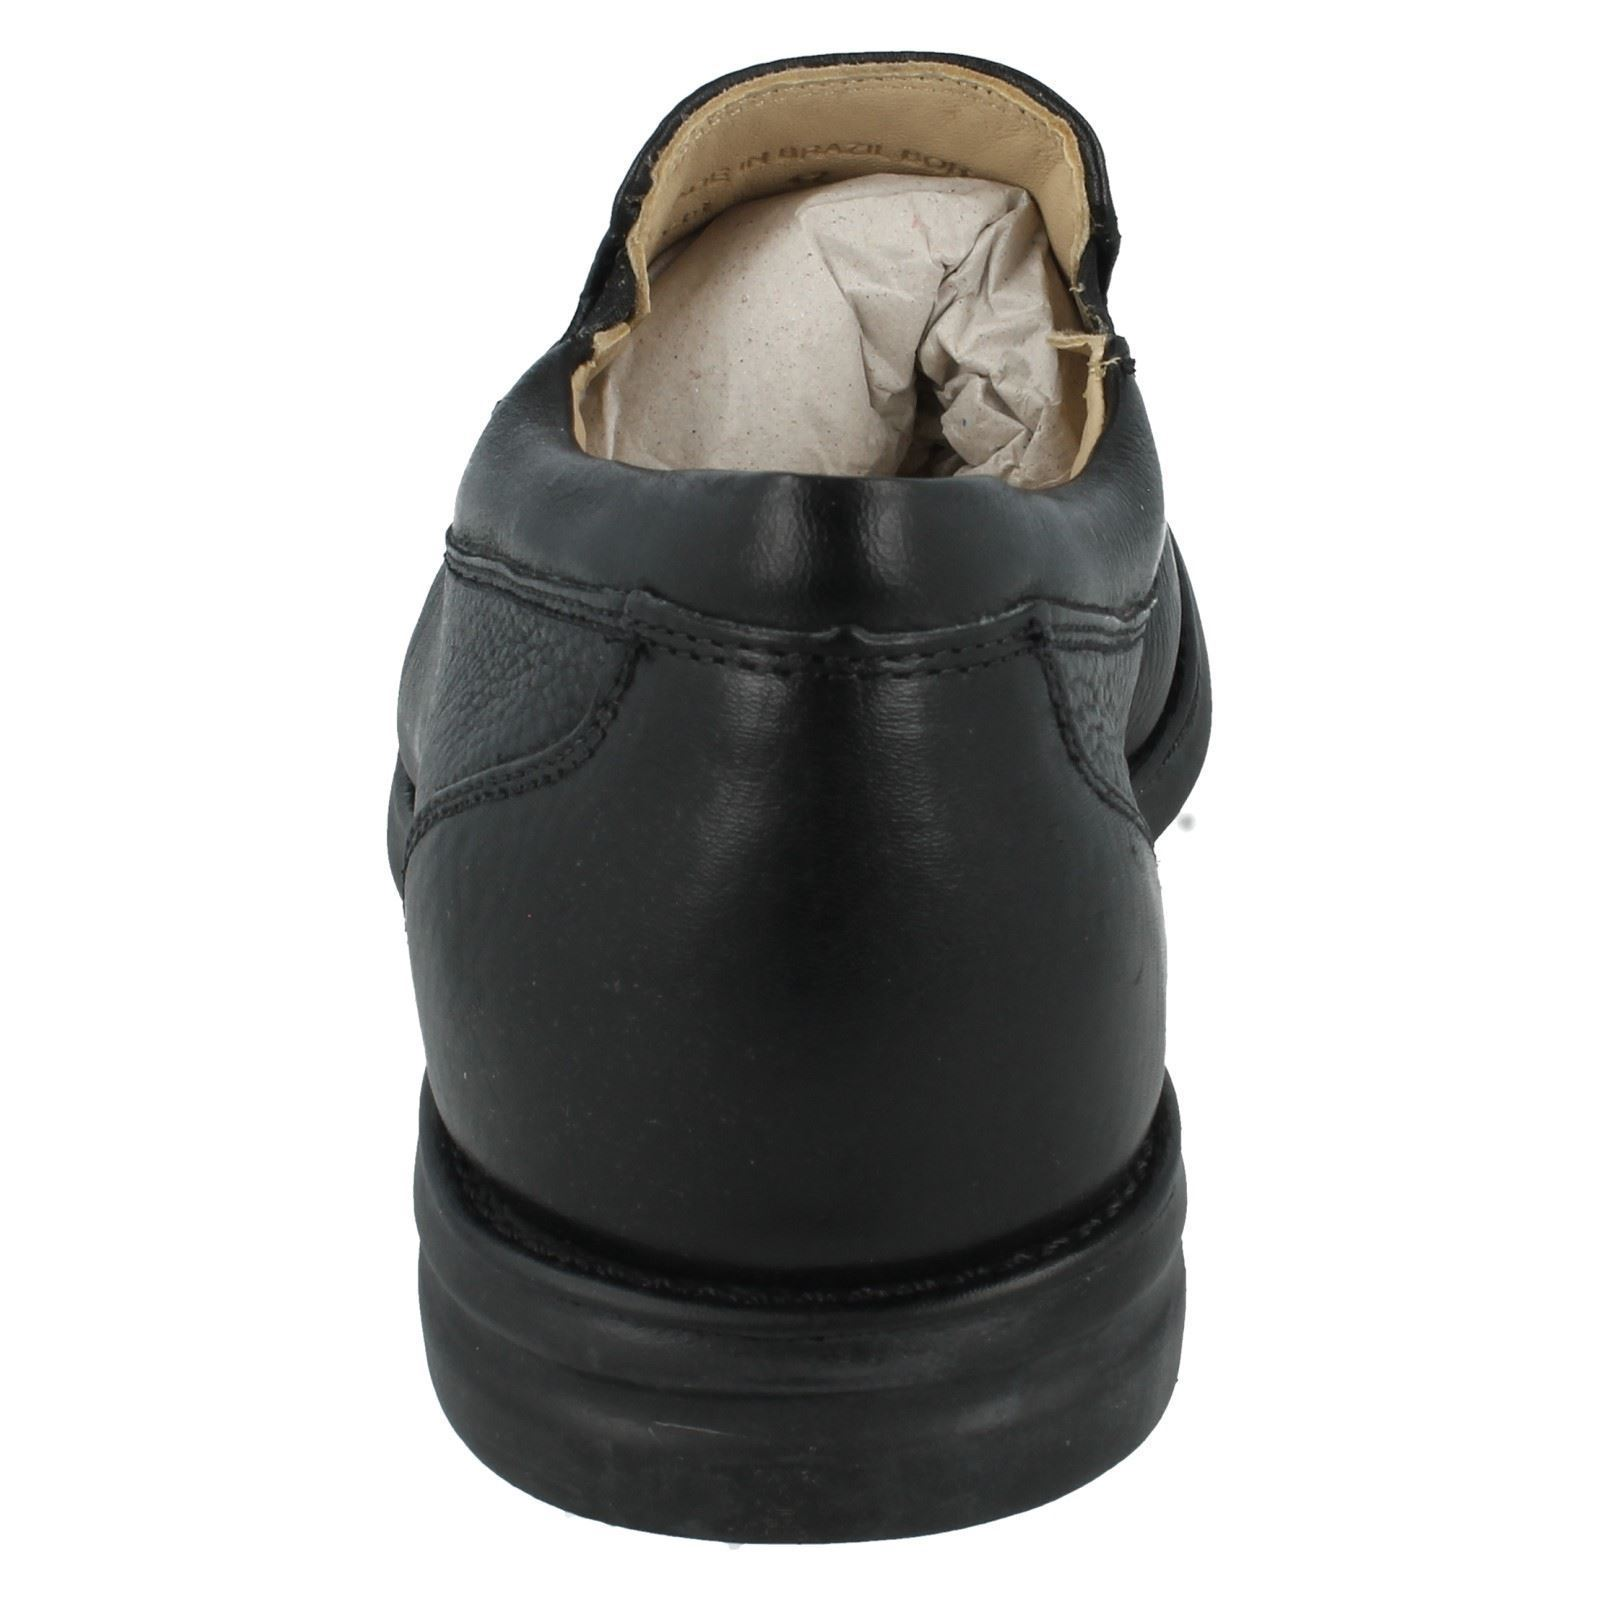 Mens Anatomic & Co Formal Loafers Bernardo